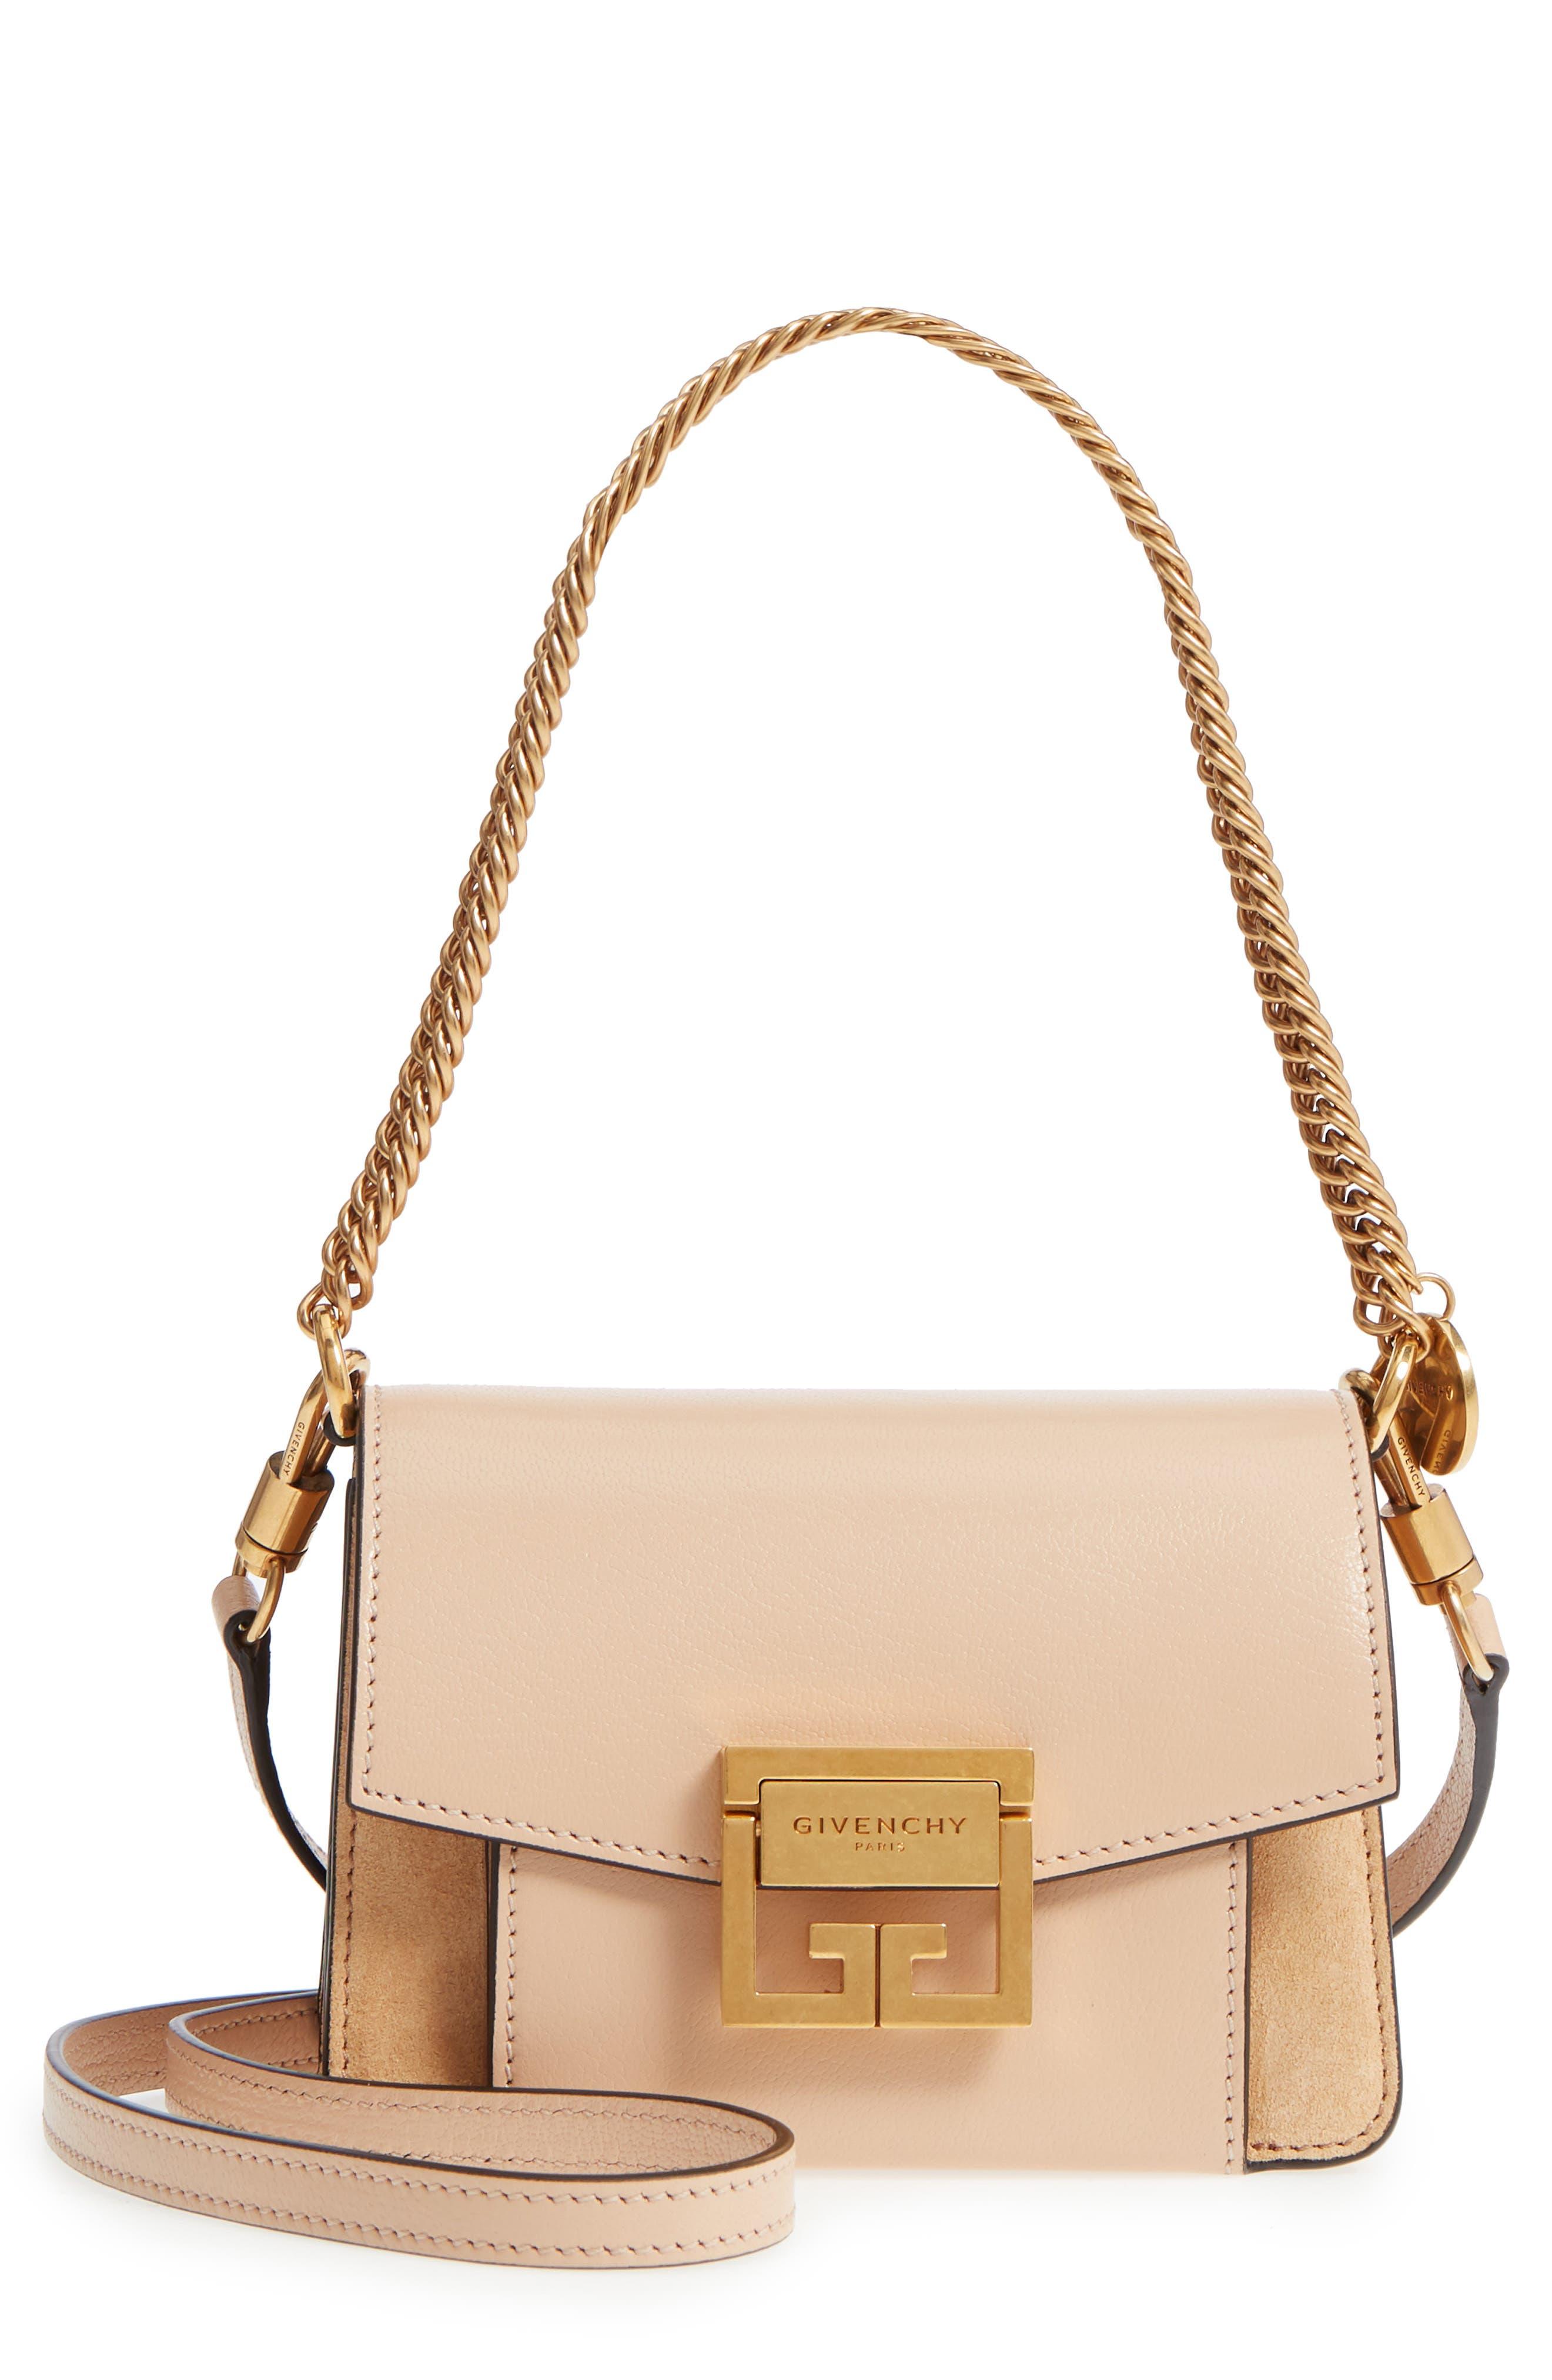 Mini GV3 Leather & Suede Crossbody Bag,                             Main thumbnail 1, color,                             Nude/ Light Beige